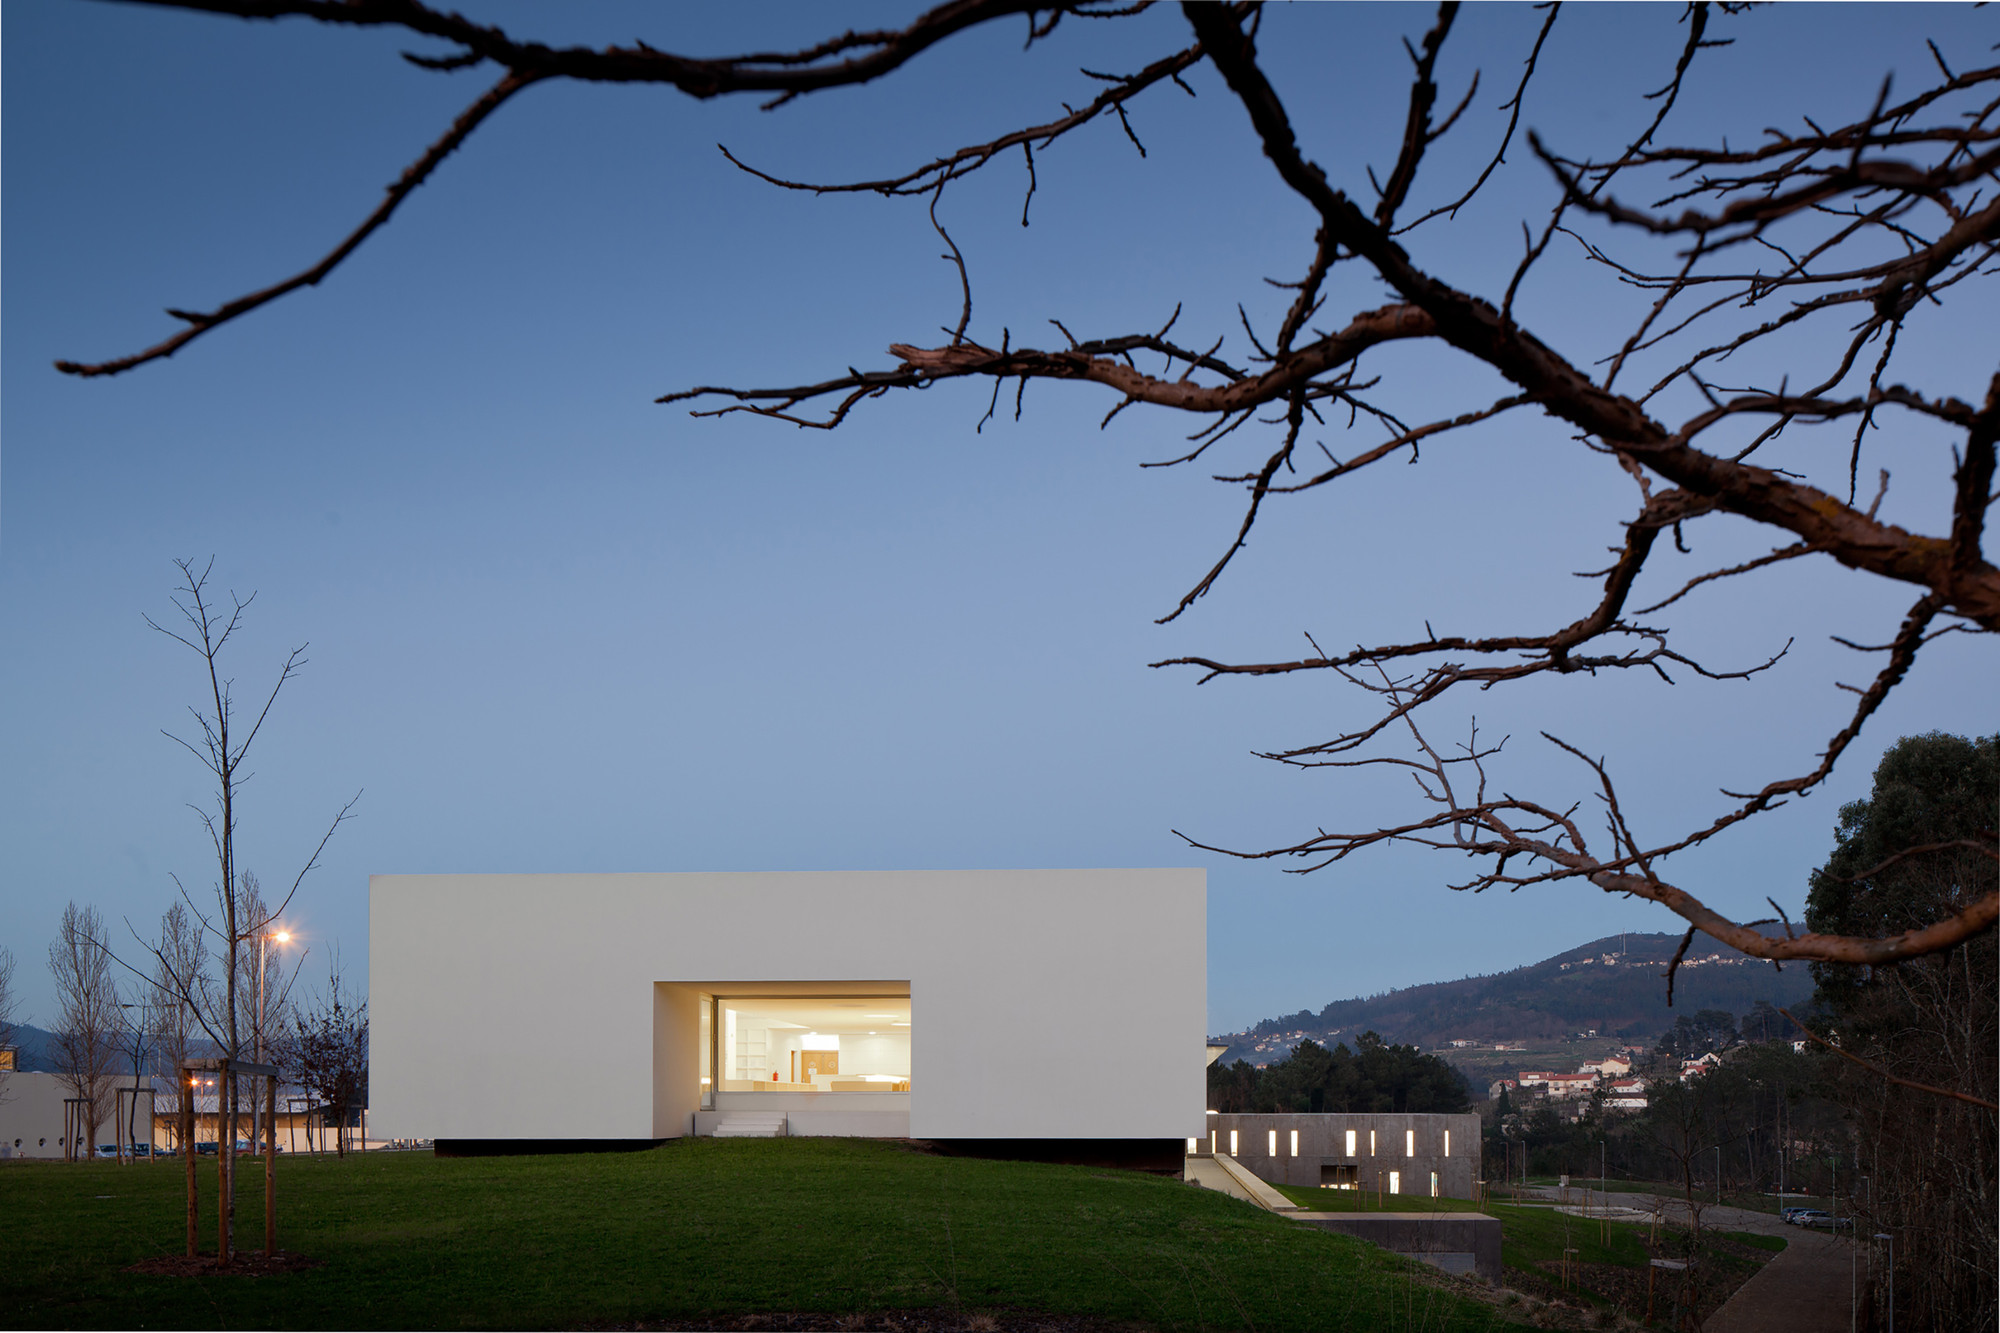 Melgaço Sports School Monte Prado / Pedro Reis Arquitecto, © José Campos | Architectural photography